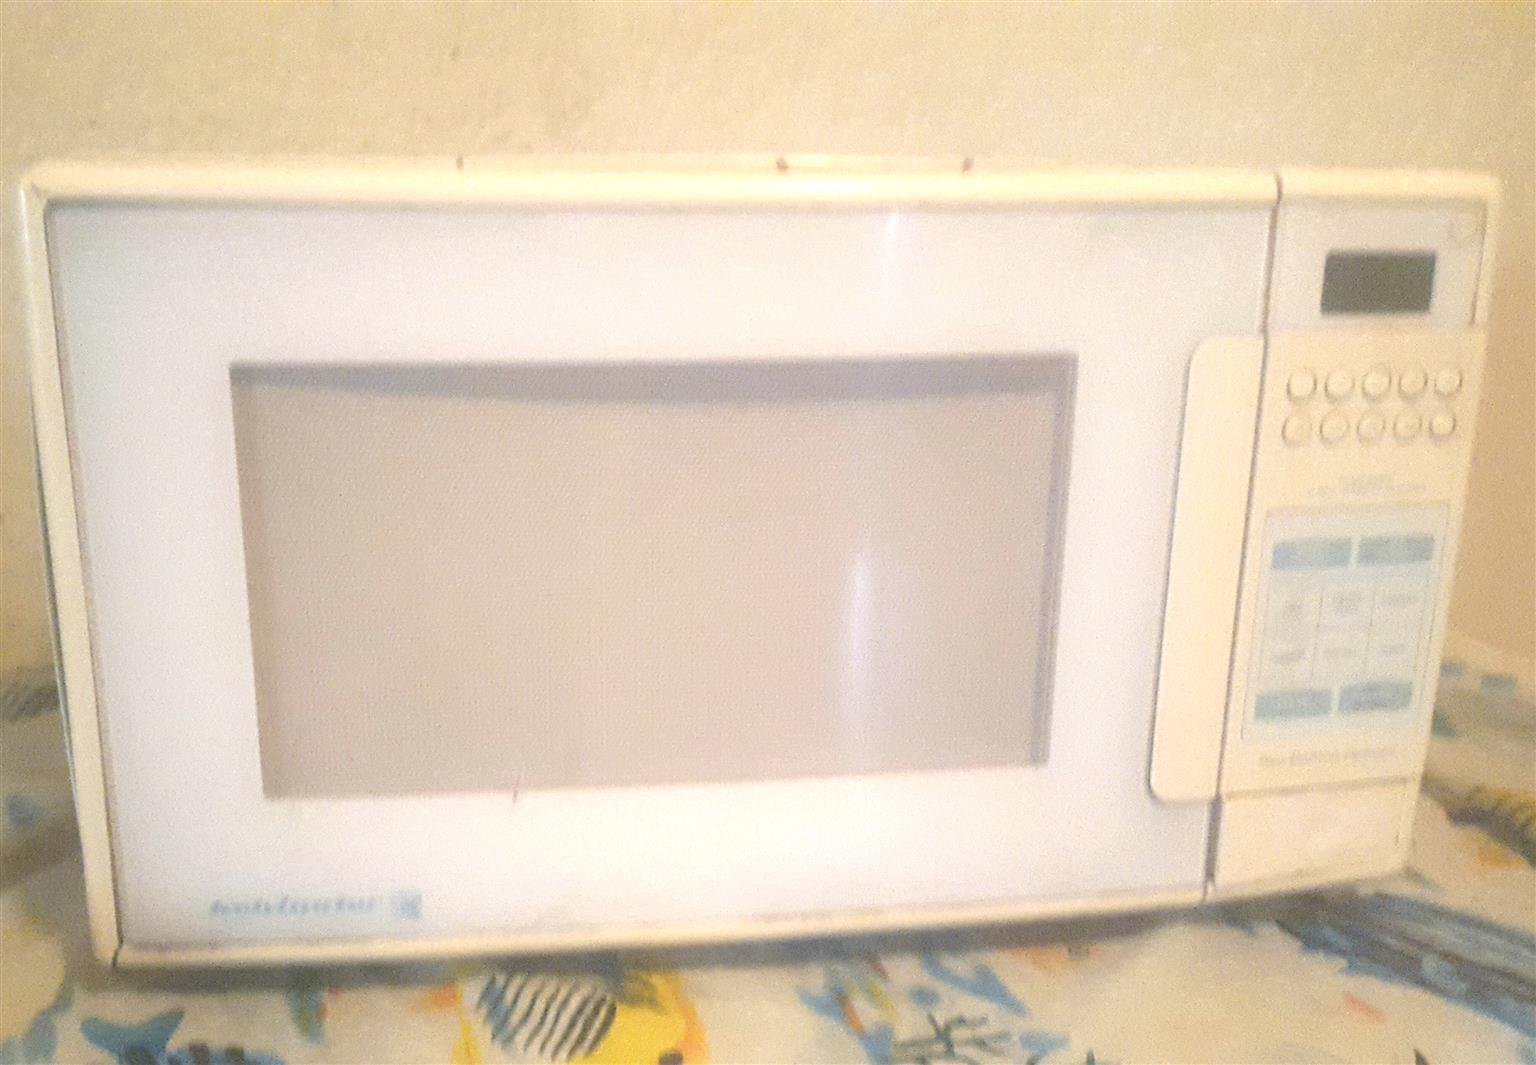 Kelvinator microwave R250